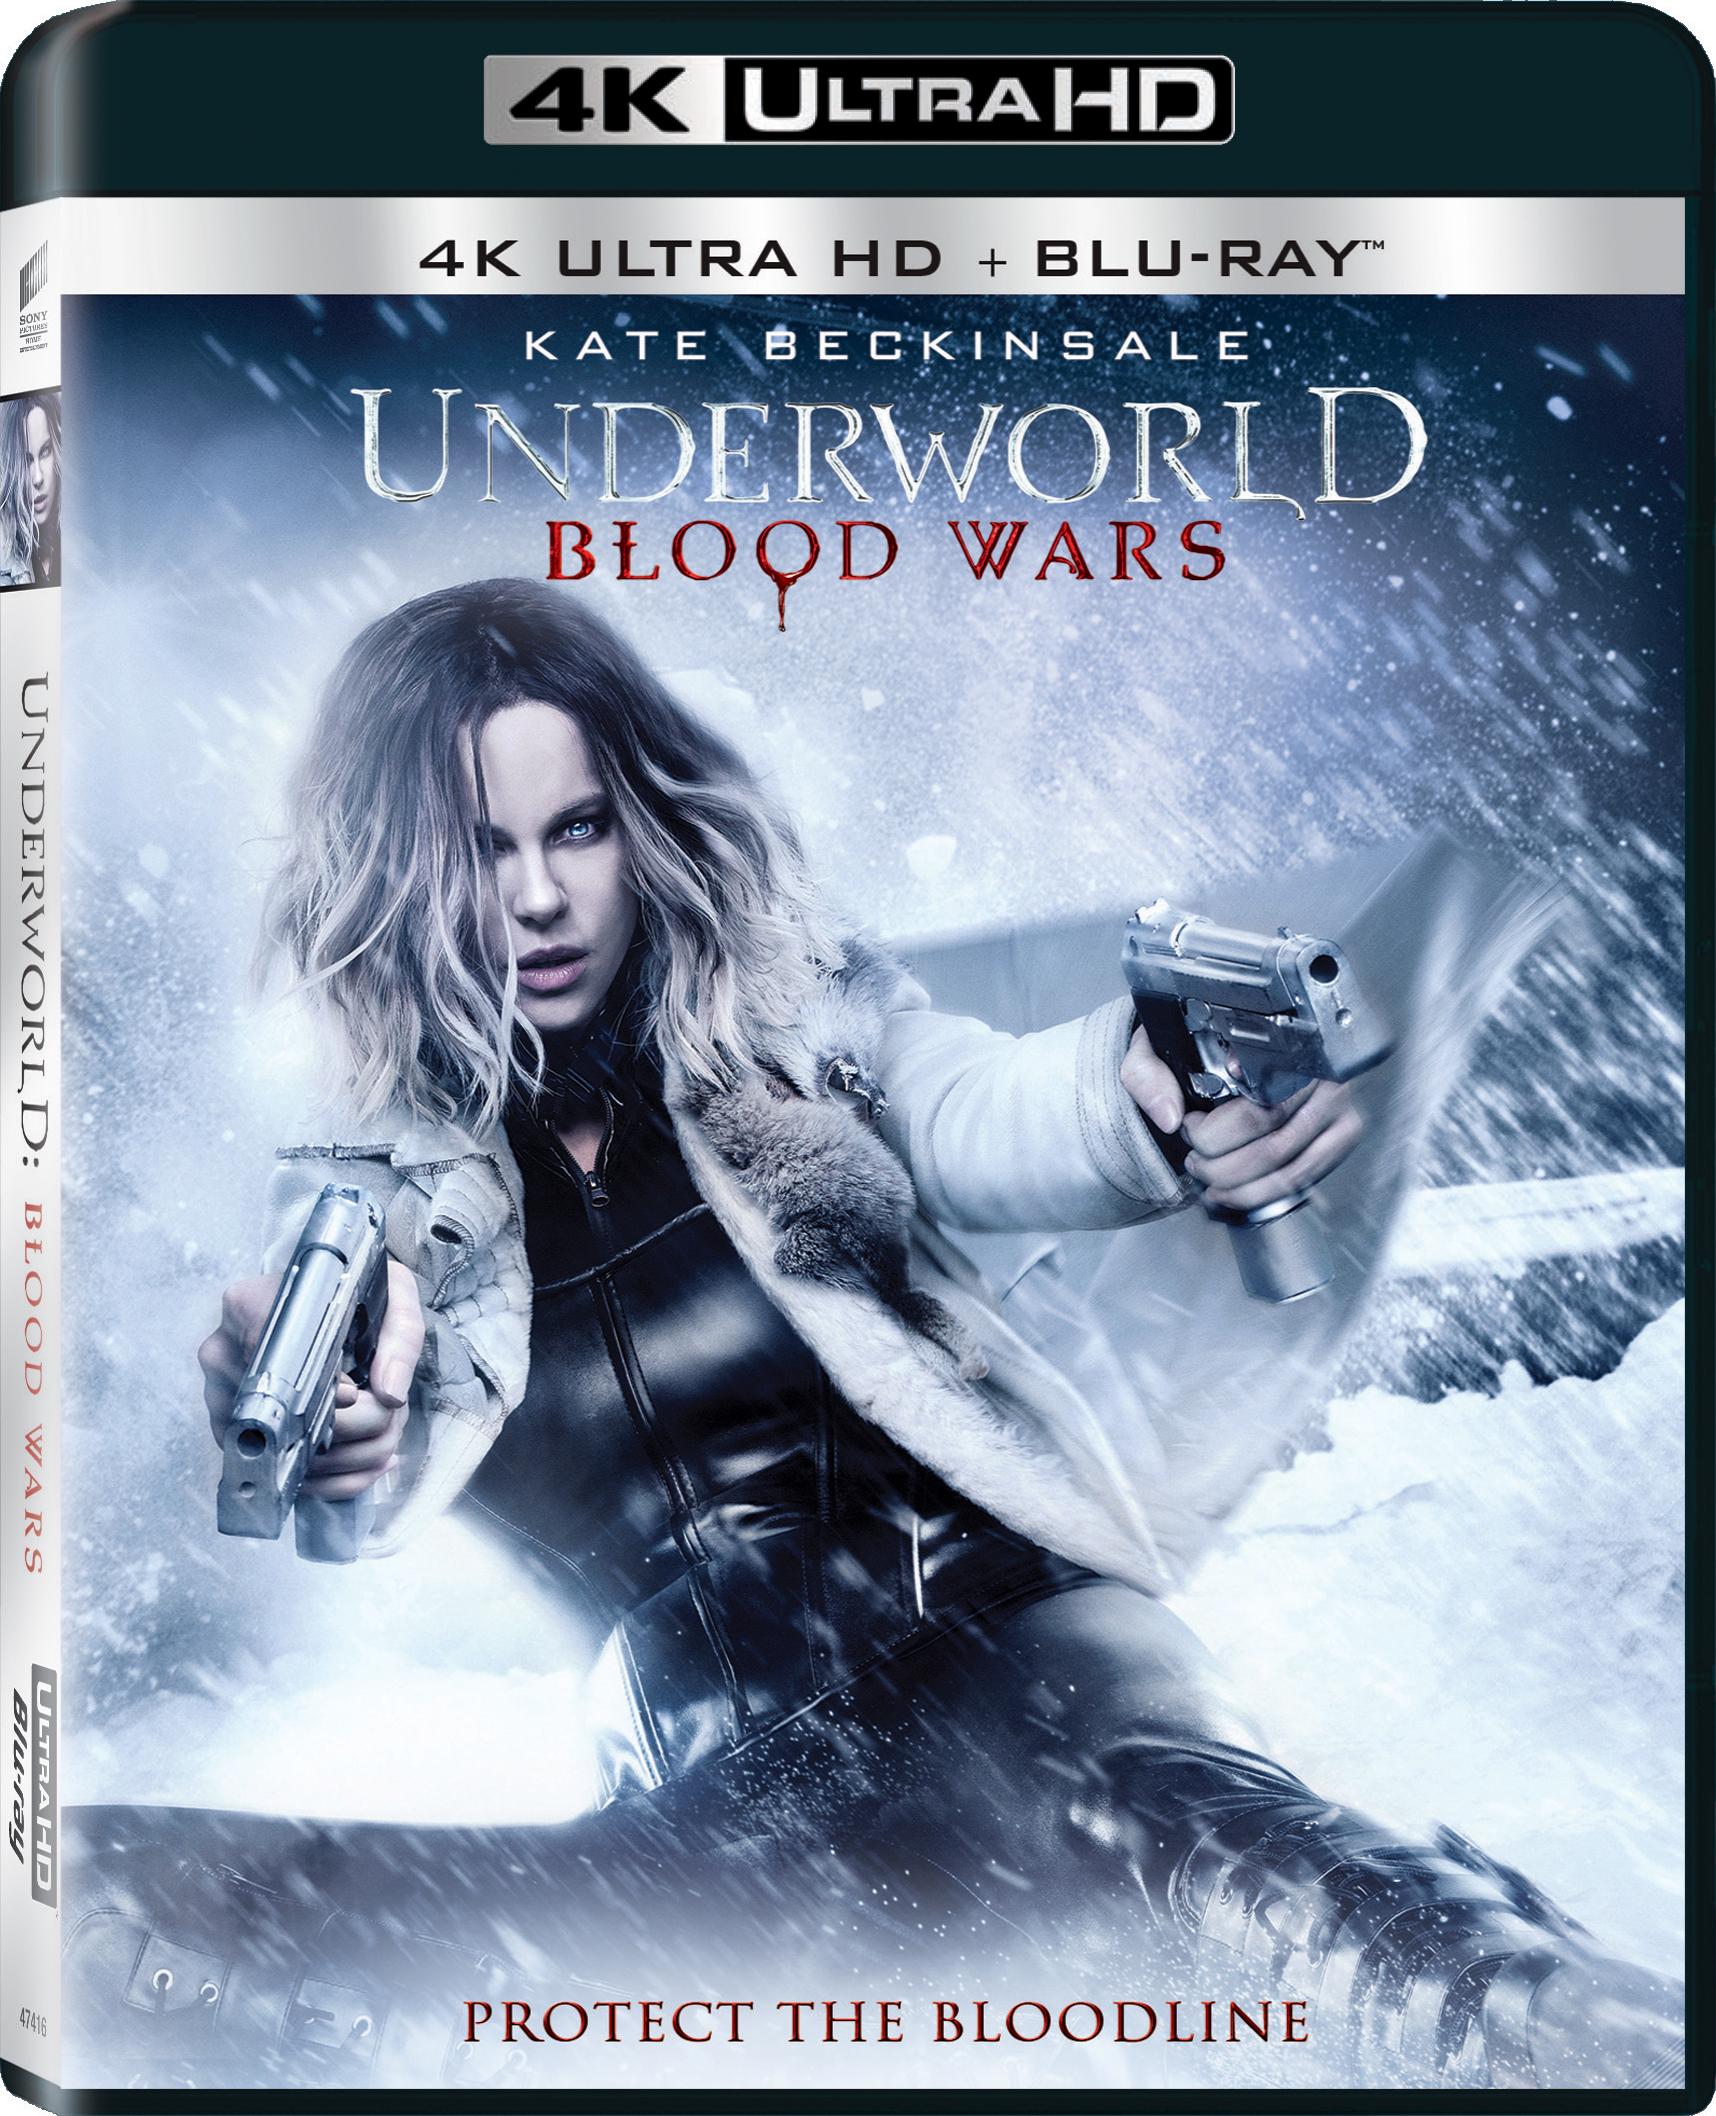 Underworld: Blood Wars 4K (2017) Ultra HD Blu-ray